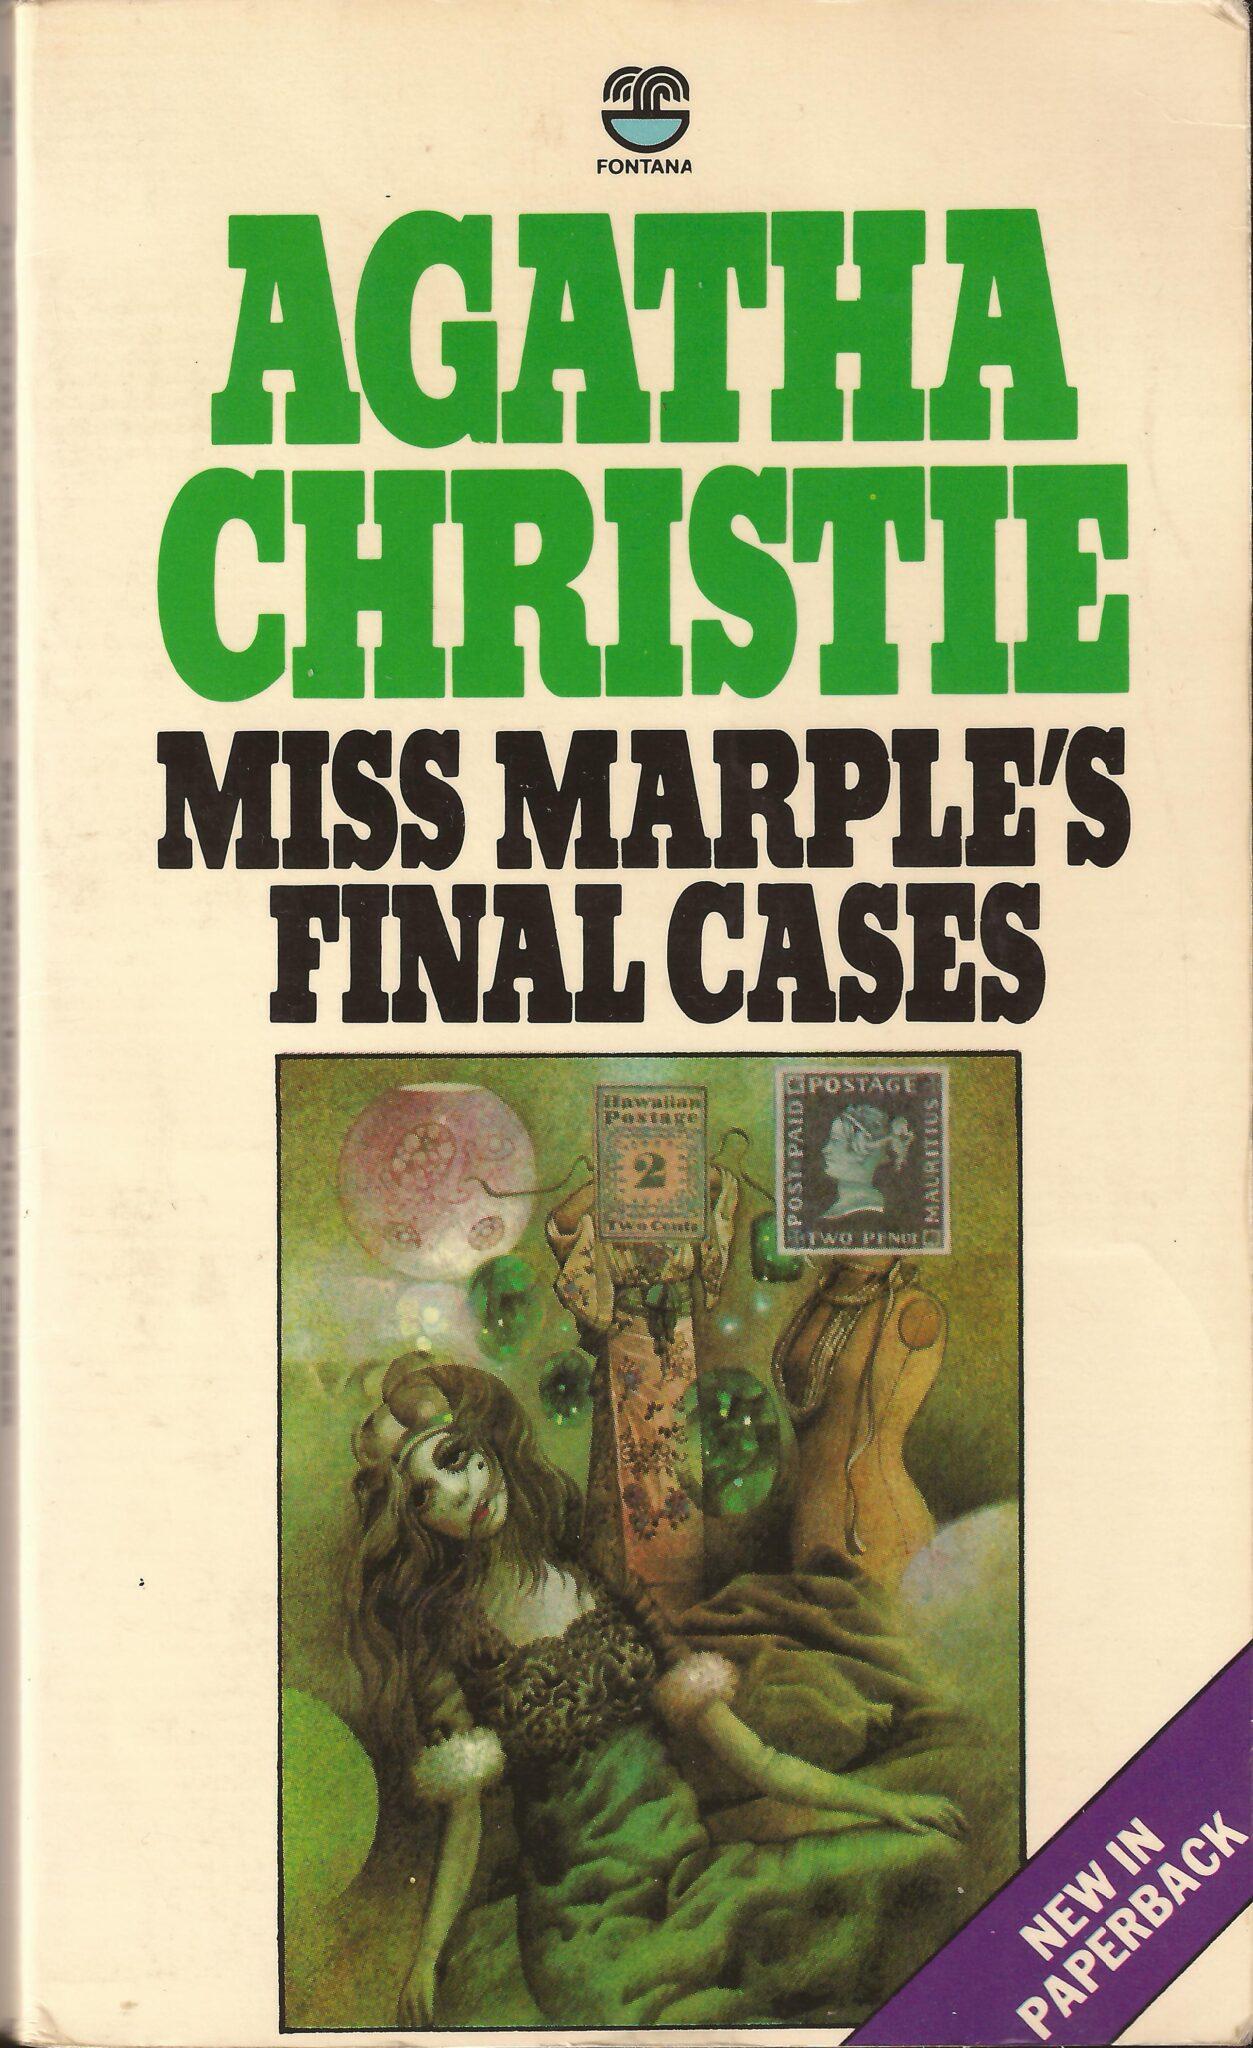 Agatha Christie Tom Adams Miss Marples Final Cases Fontana continental edn 1980